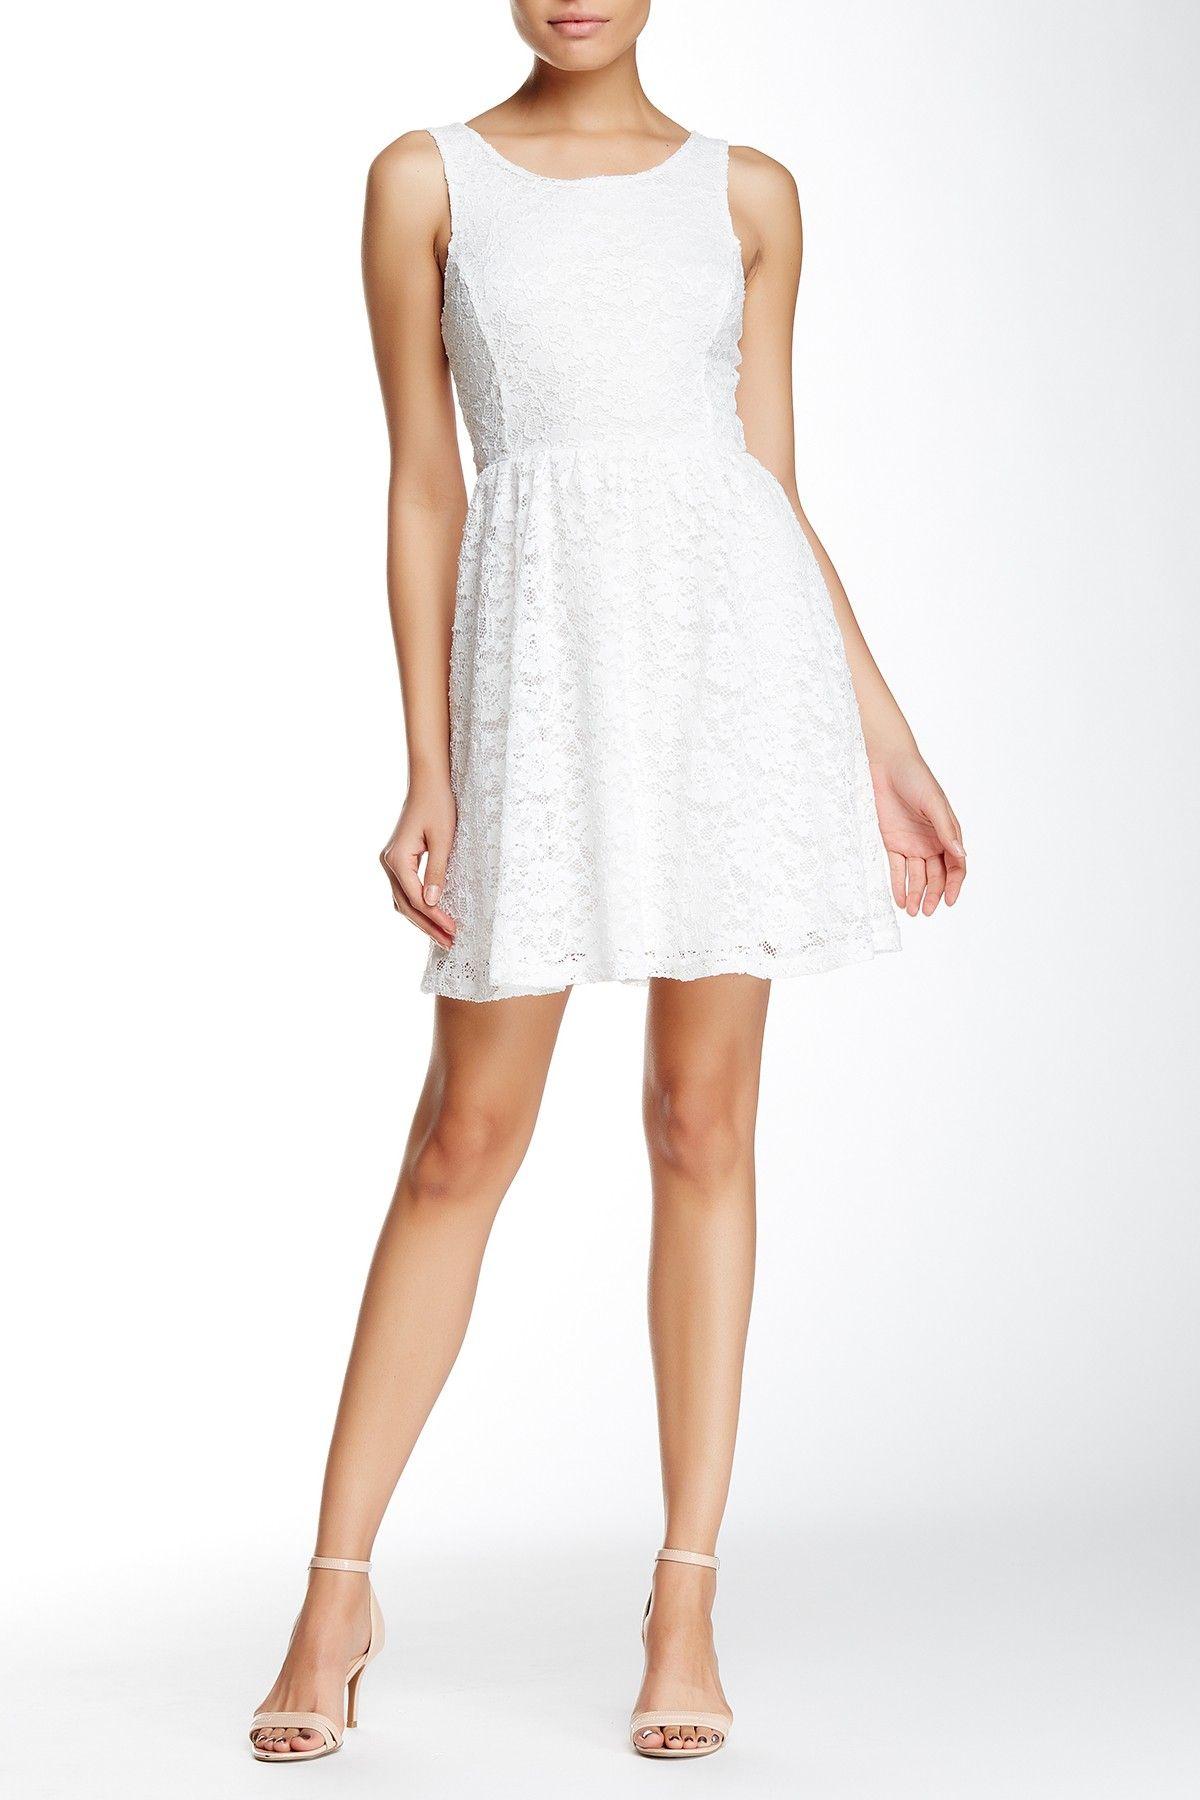 Lush Lace Skater Dress Bridesmaid Dresses Nordstrom